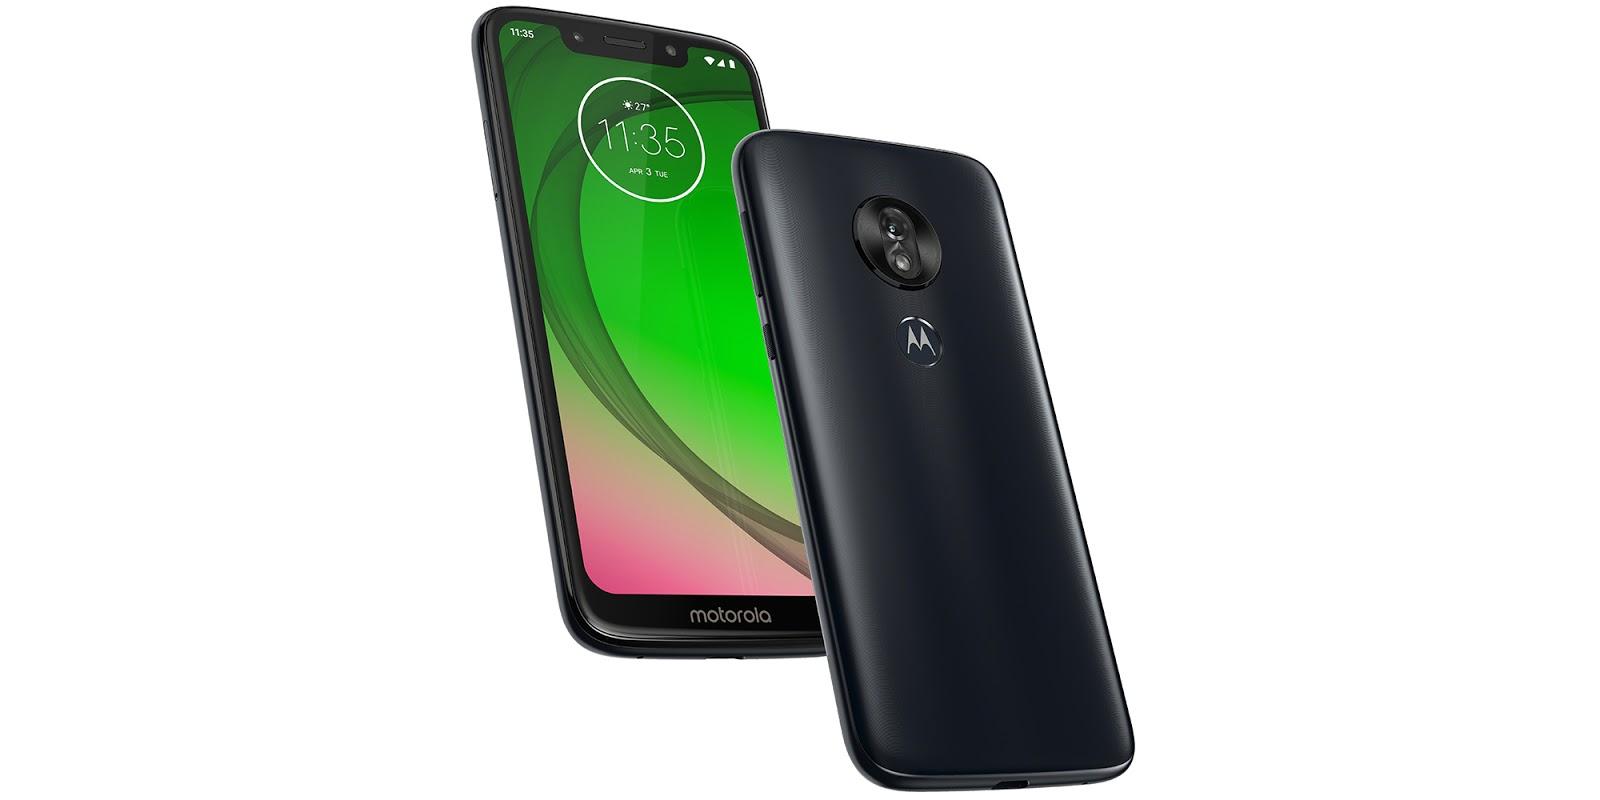 New Motorola Moto G7 series announced